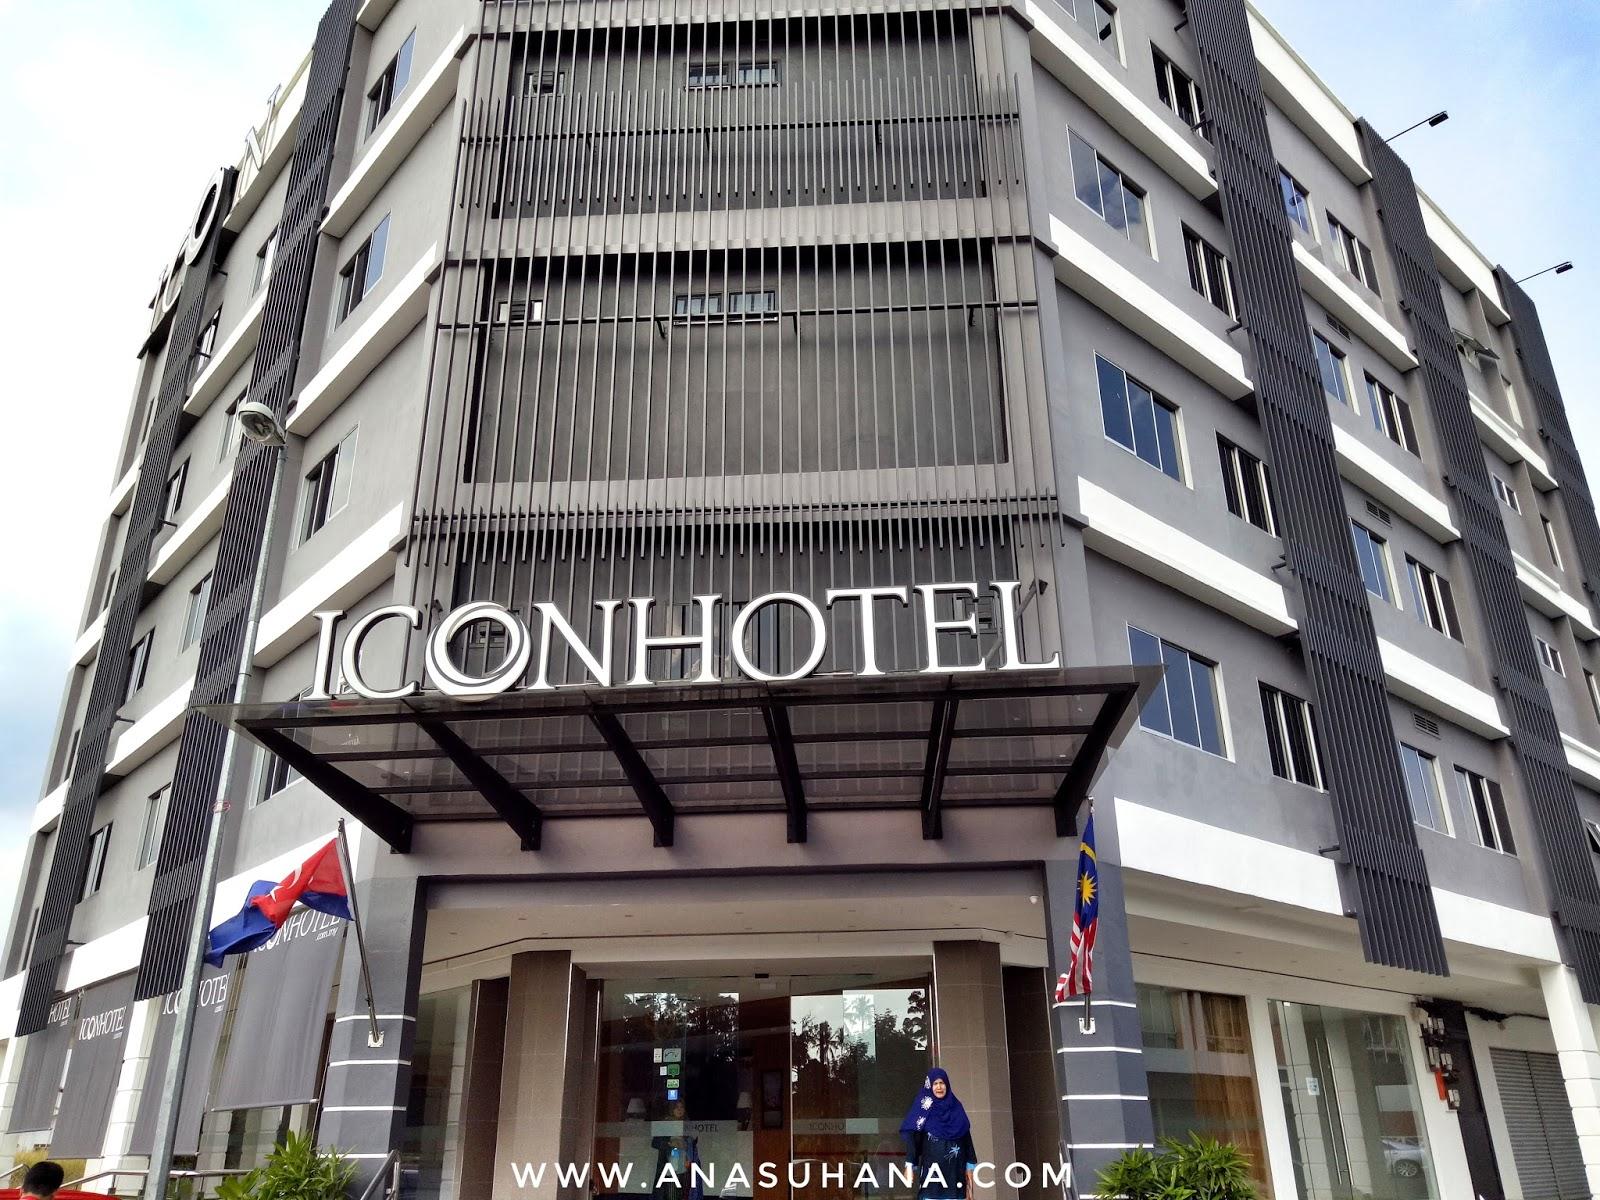 Icon Hotel Segamat